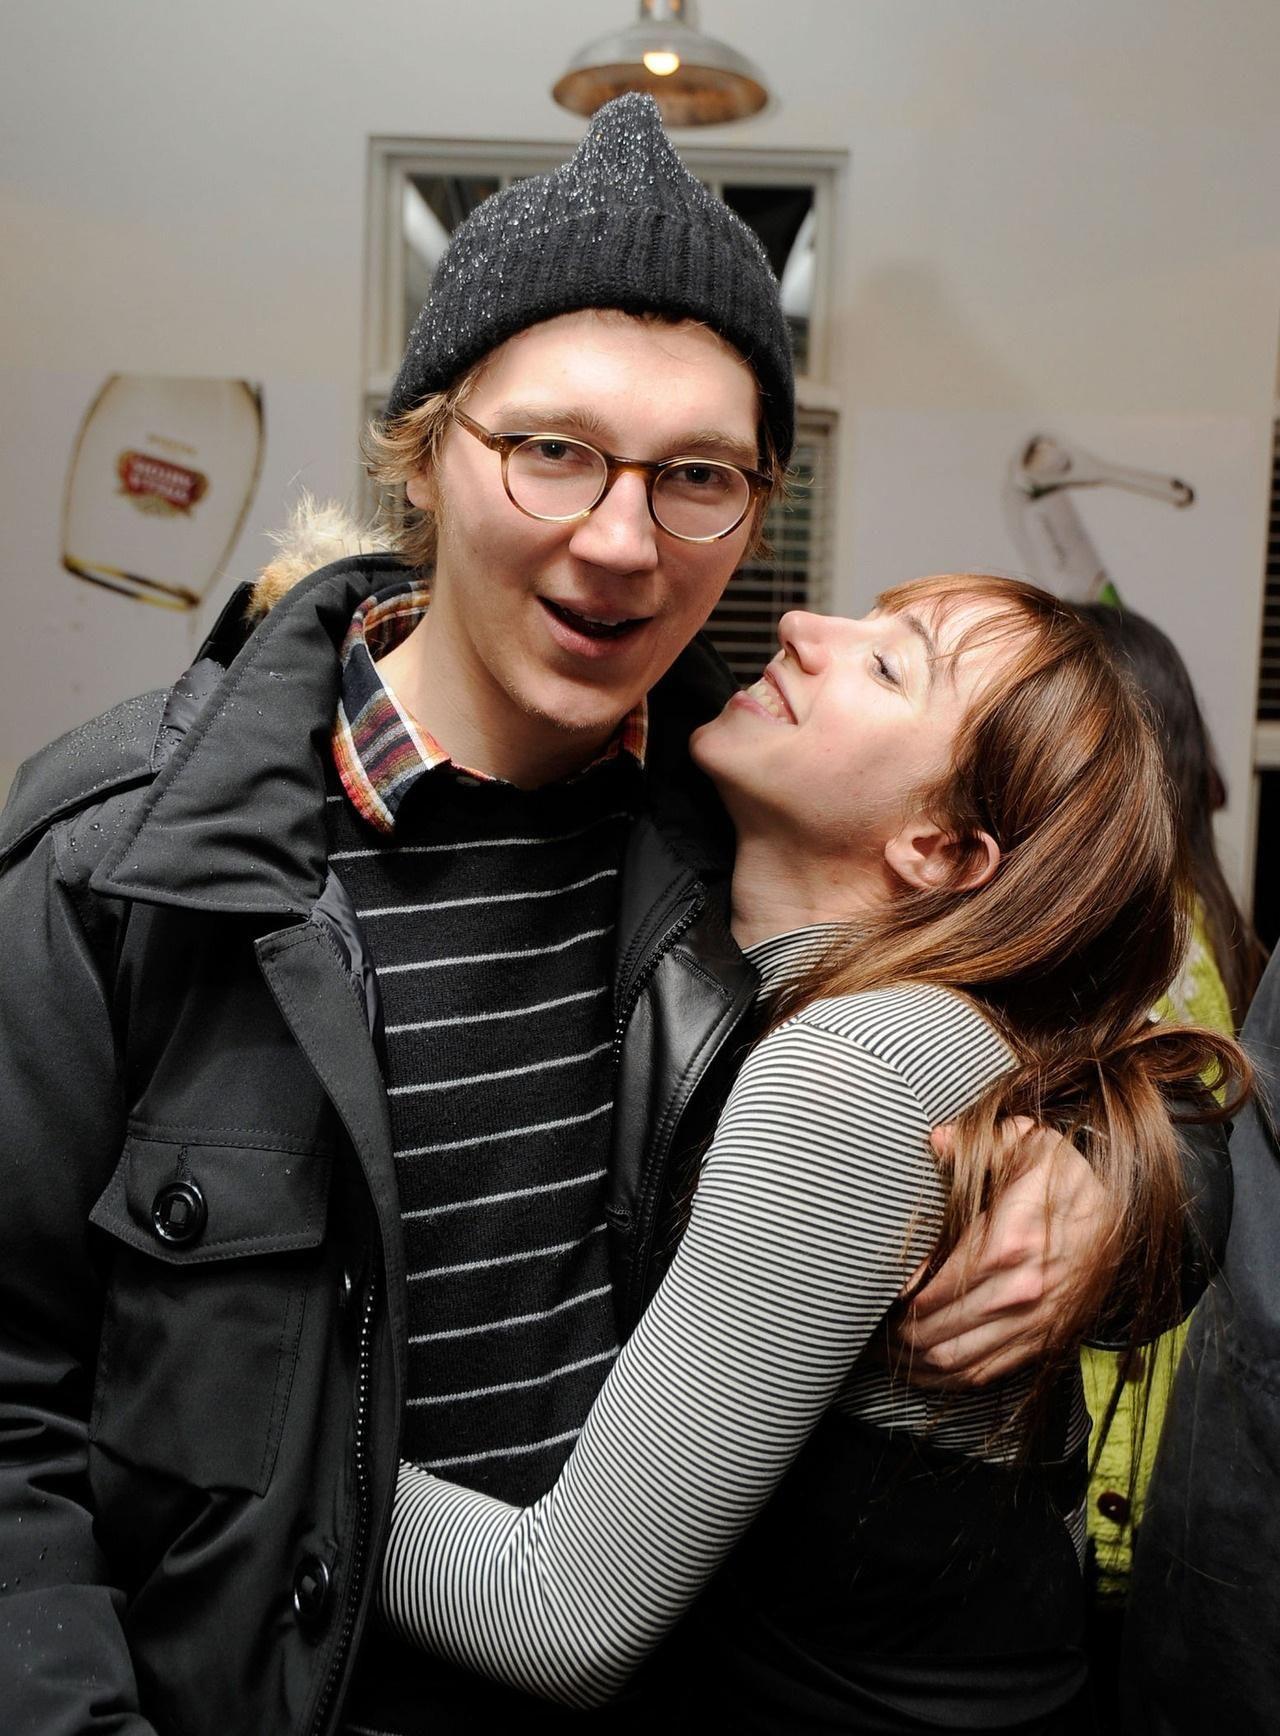 Zoe Kazan dating historia